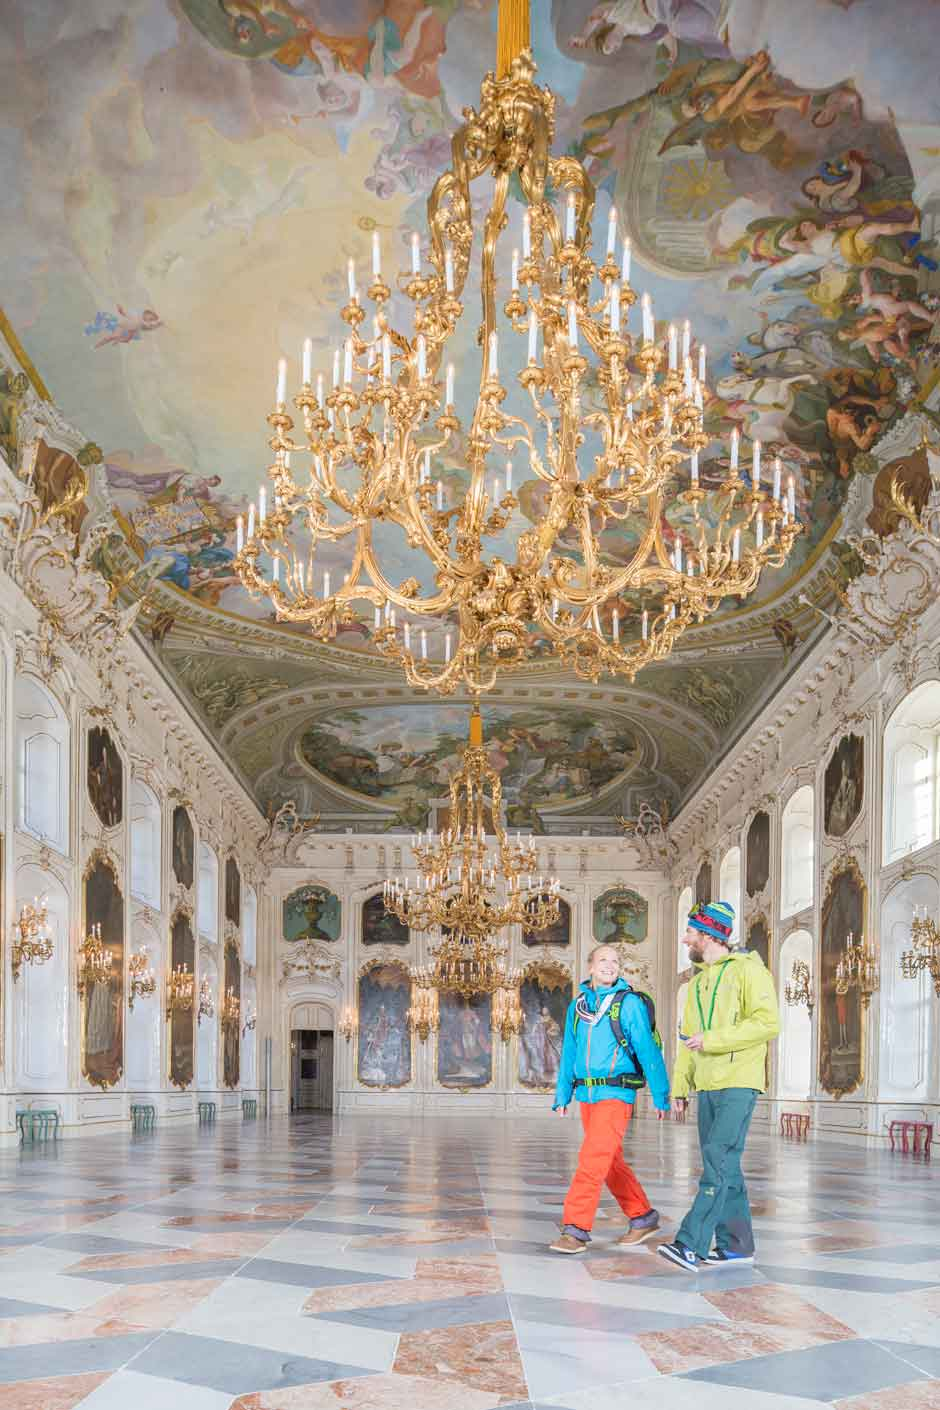 Palacio Imperial. © Innsbruck Tourismus / Christian Vorhofer